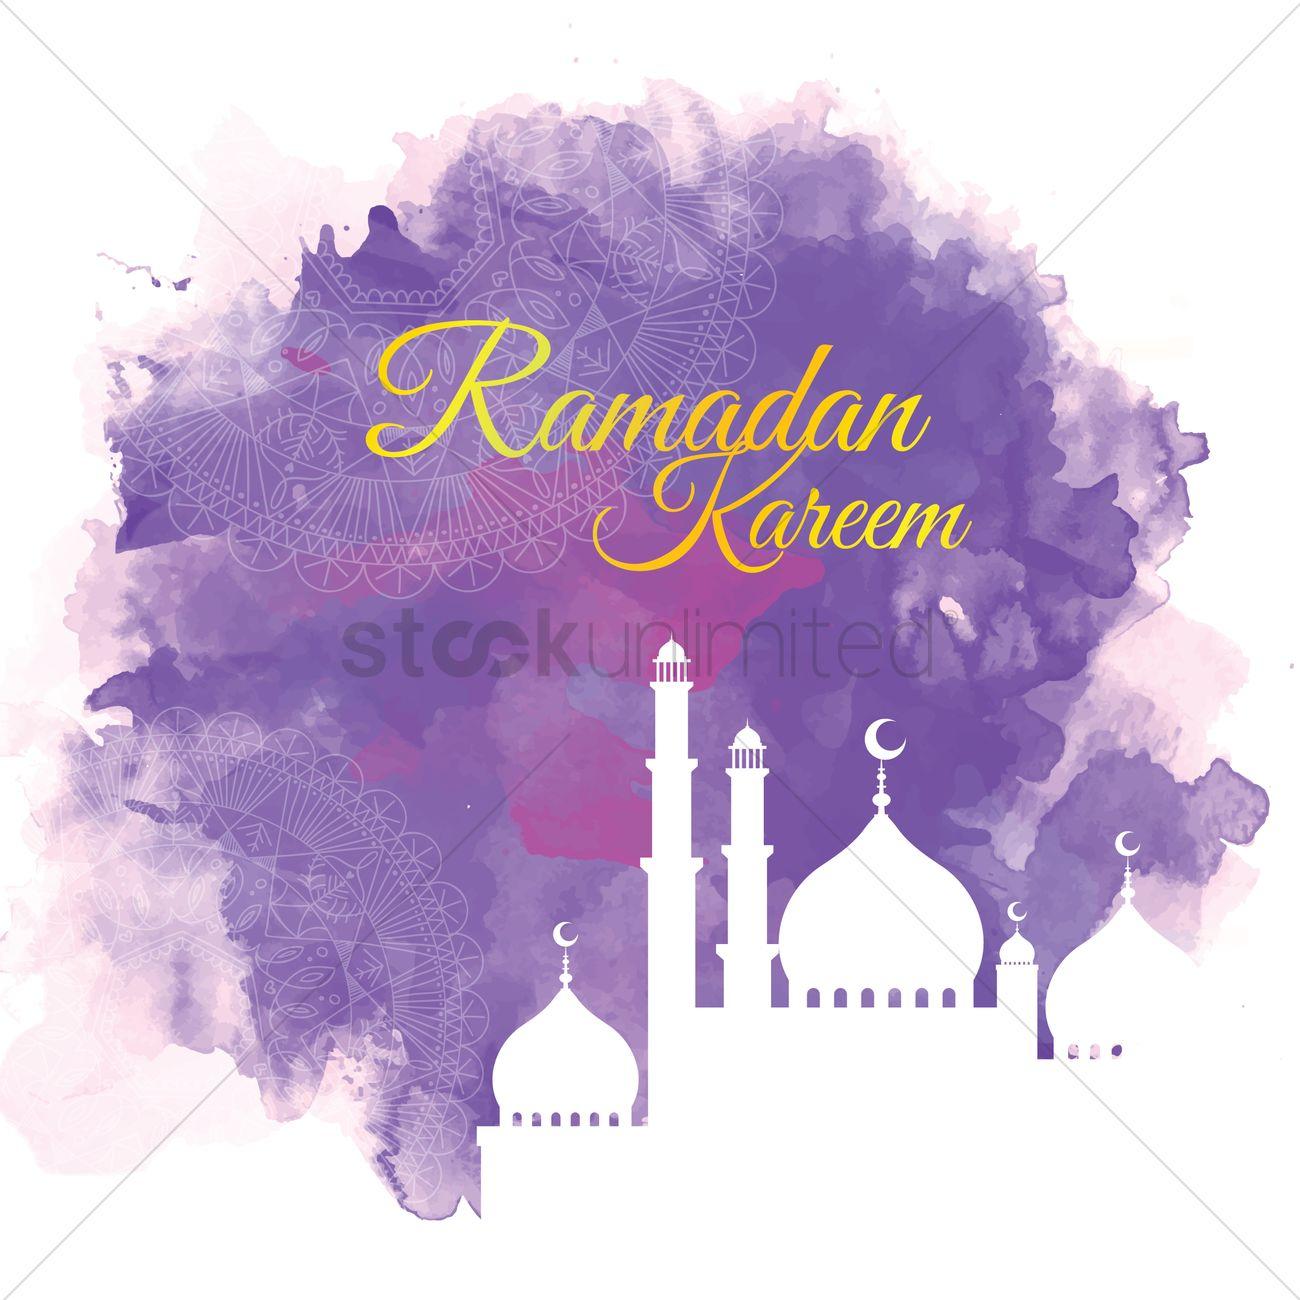 Ramadan Kareem Greeting Vector Image 1827006 Stockunlimited